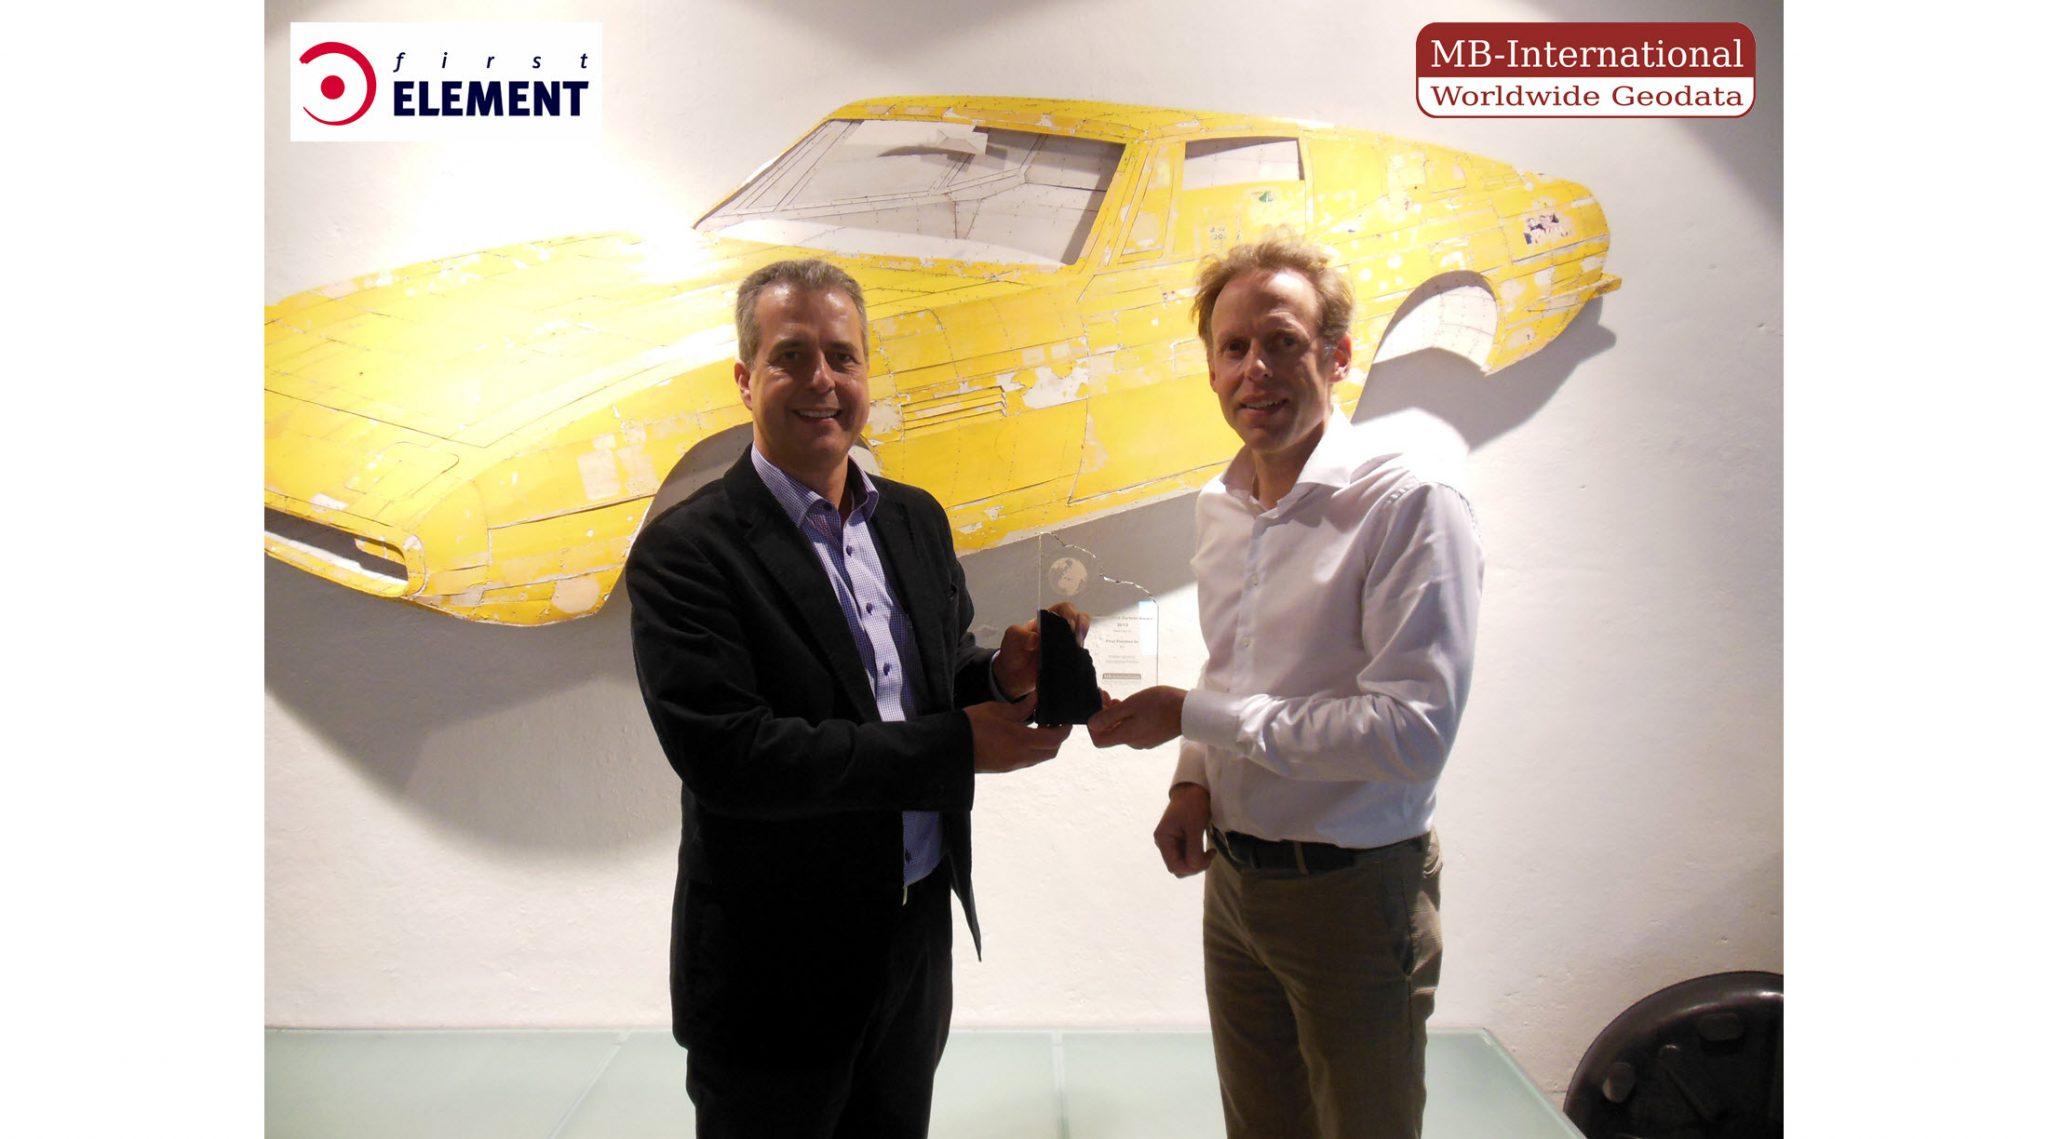 First Element partnership MB-I